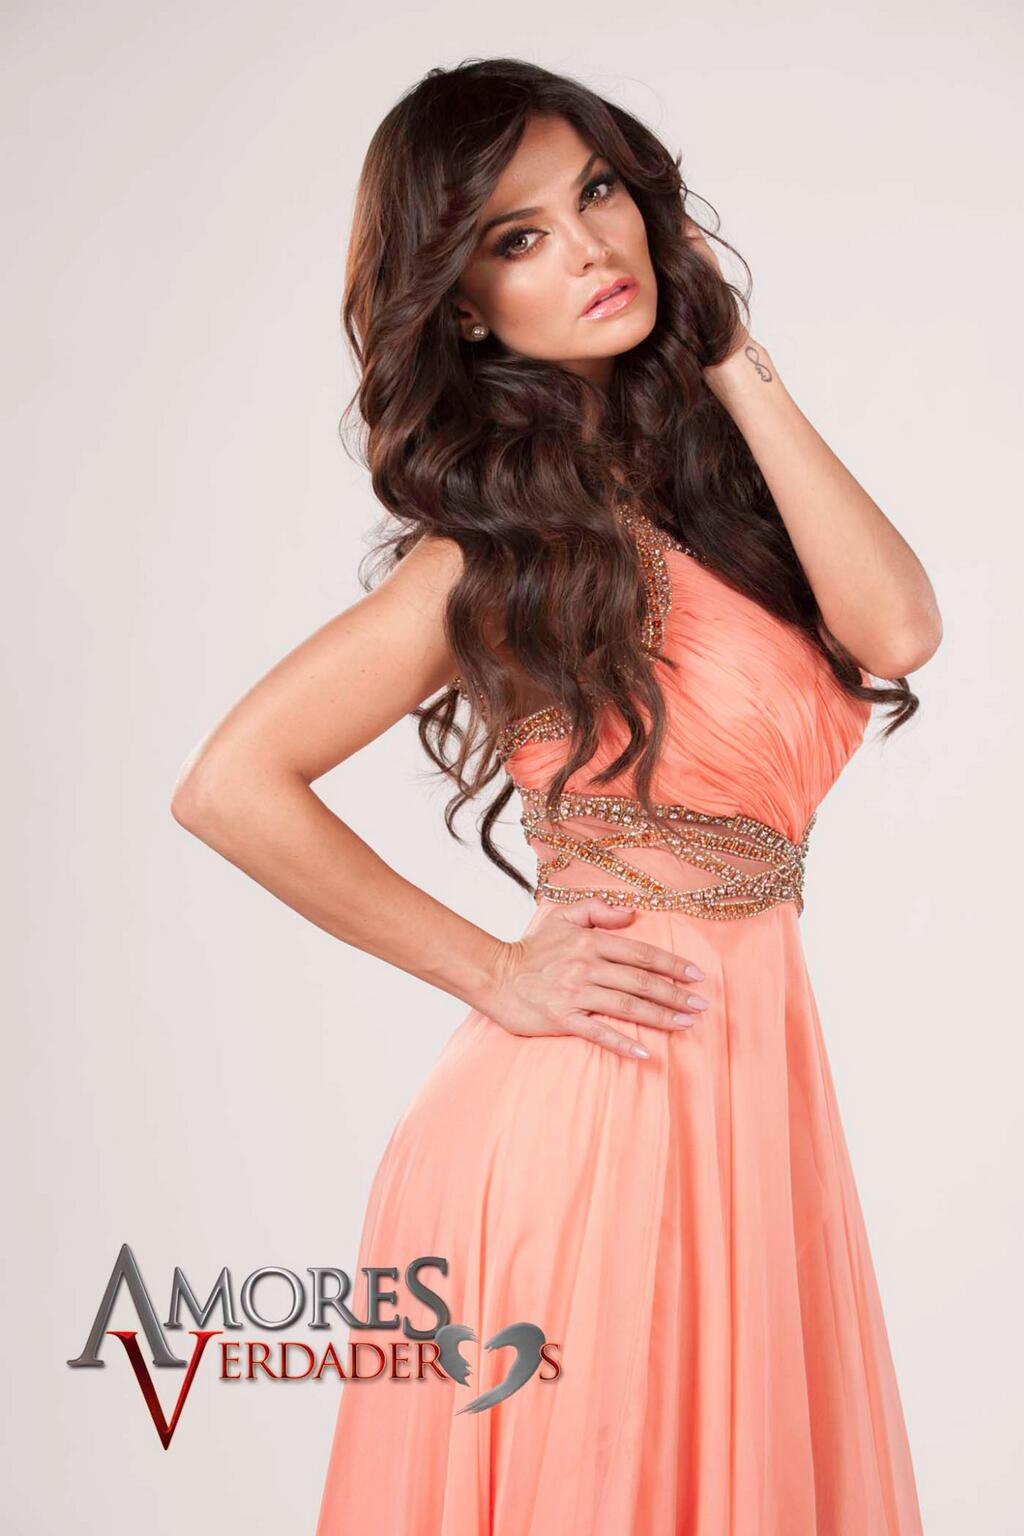 Marisol Gonzalez Amores Verdaderos